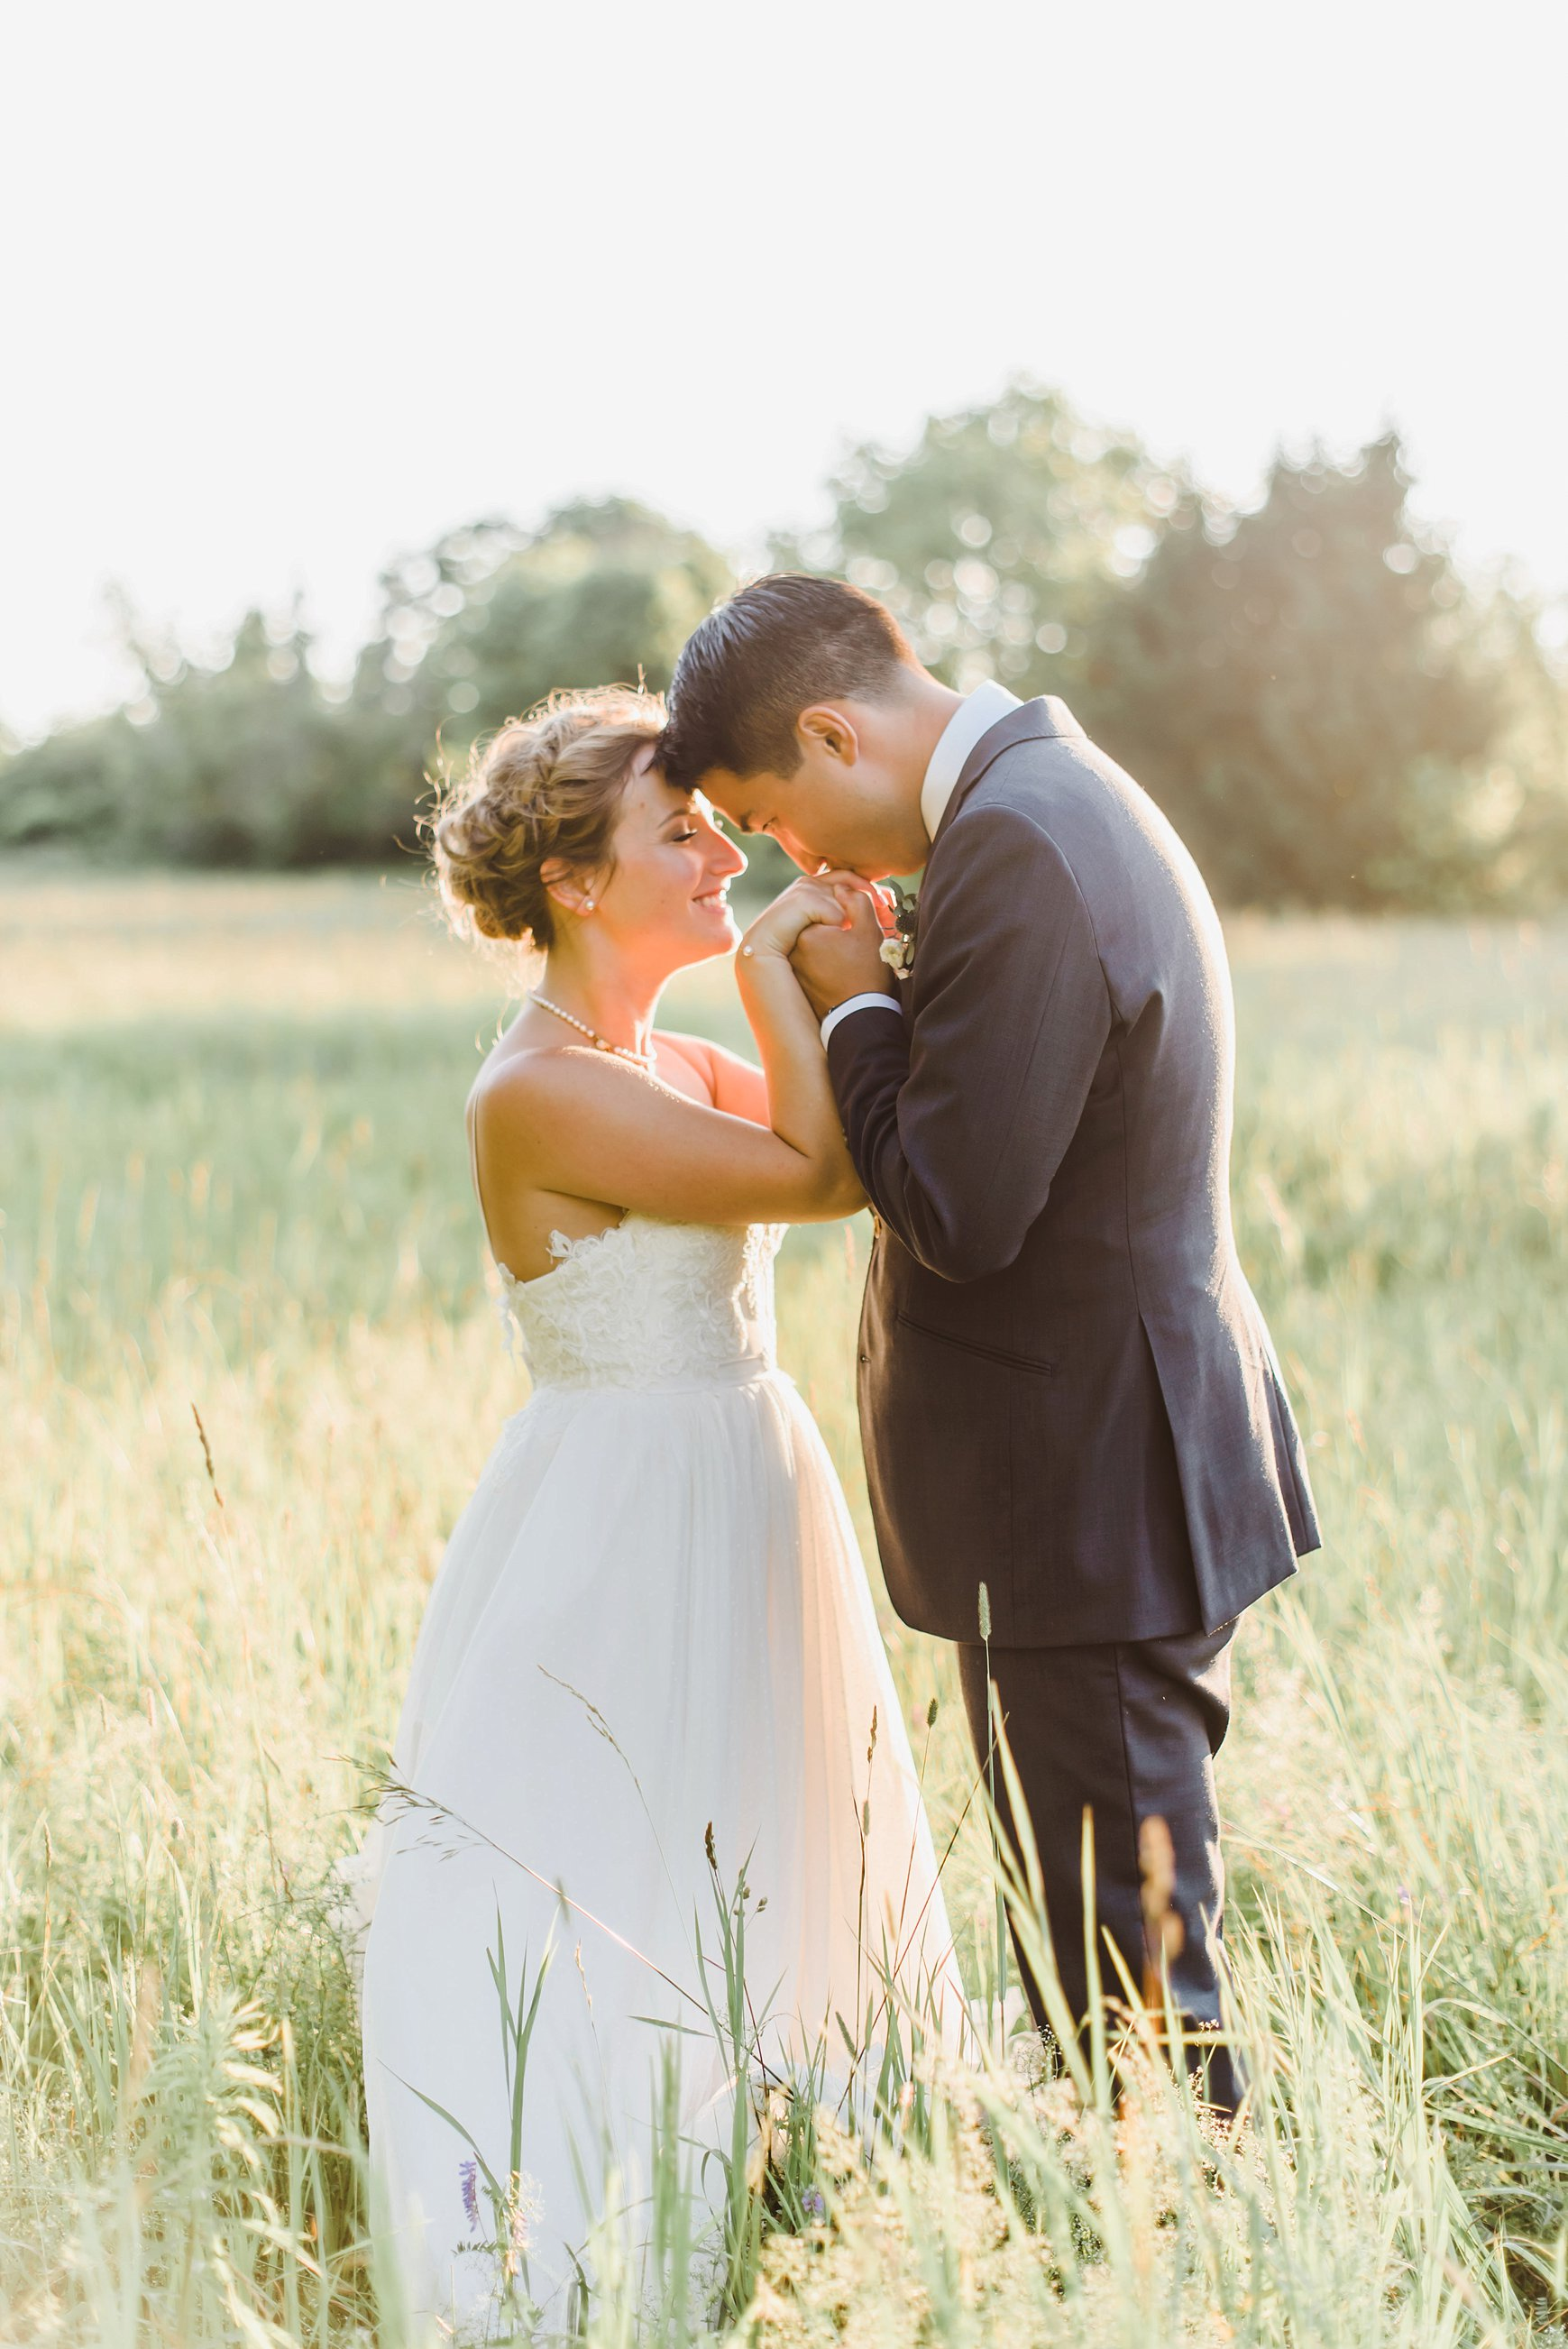 light airy indie fine art ottawa wedding photographer | Ali and Batoul Photography_0908.jpg